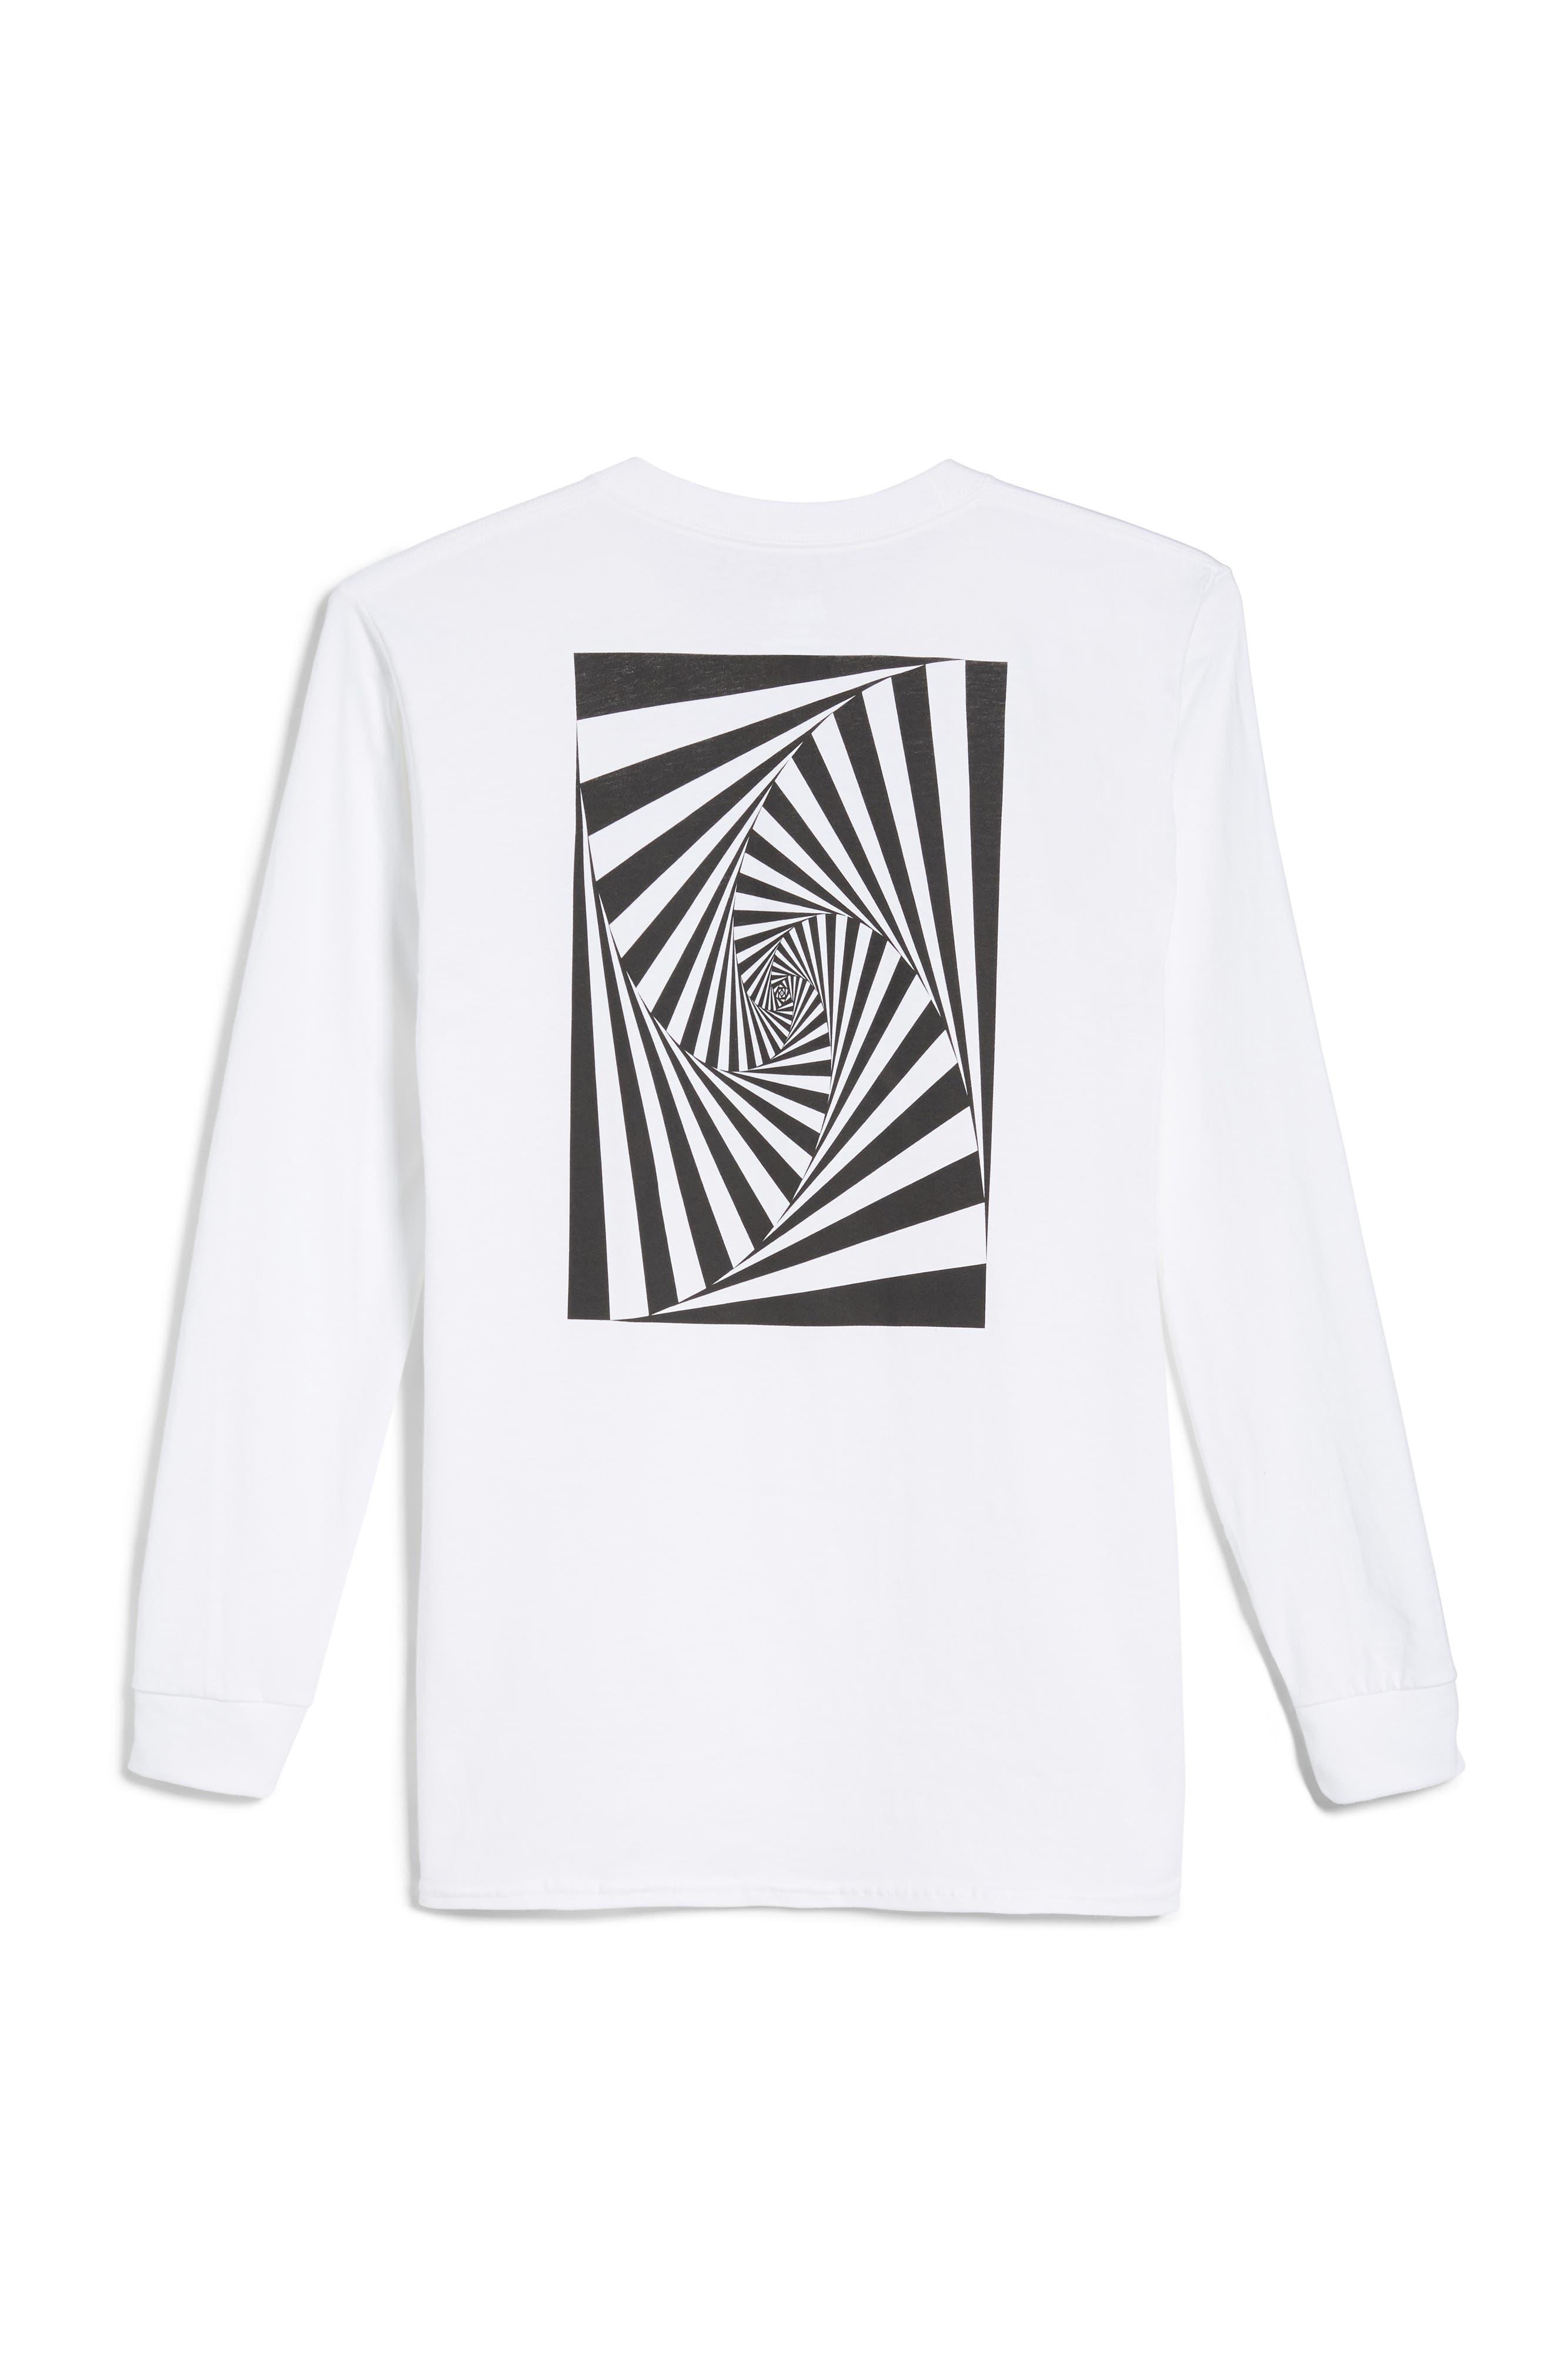 Vision Street Wear Long Sleeve T-Shirt,                             Main thumbnail 1, color,                             100